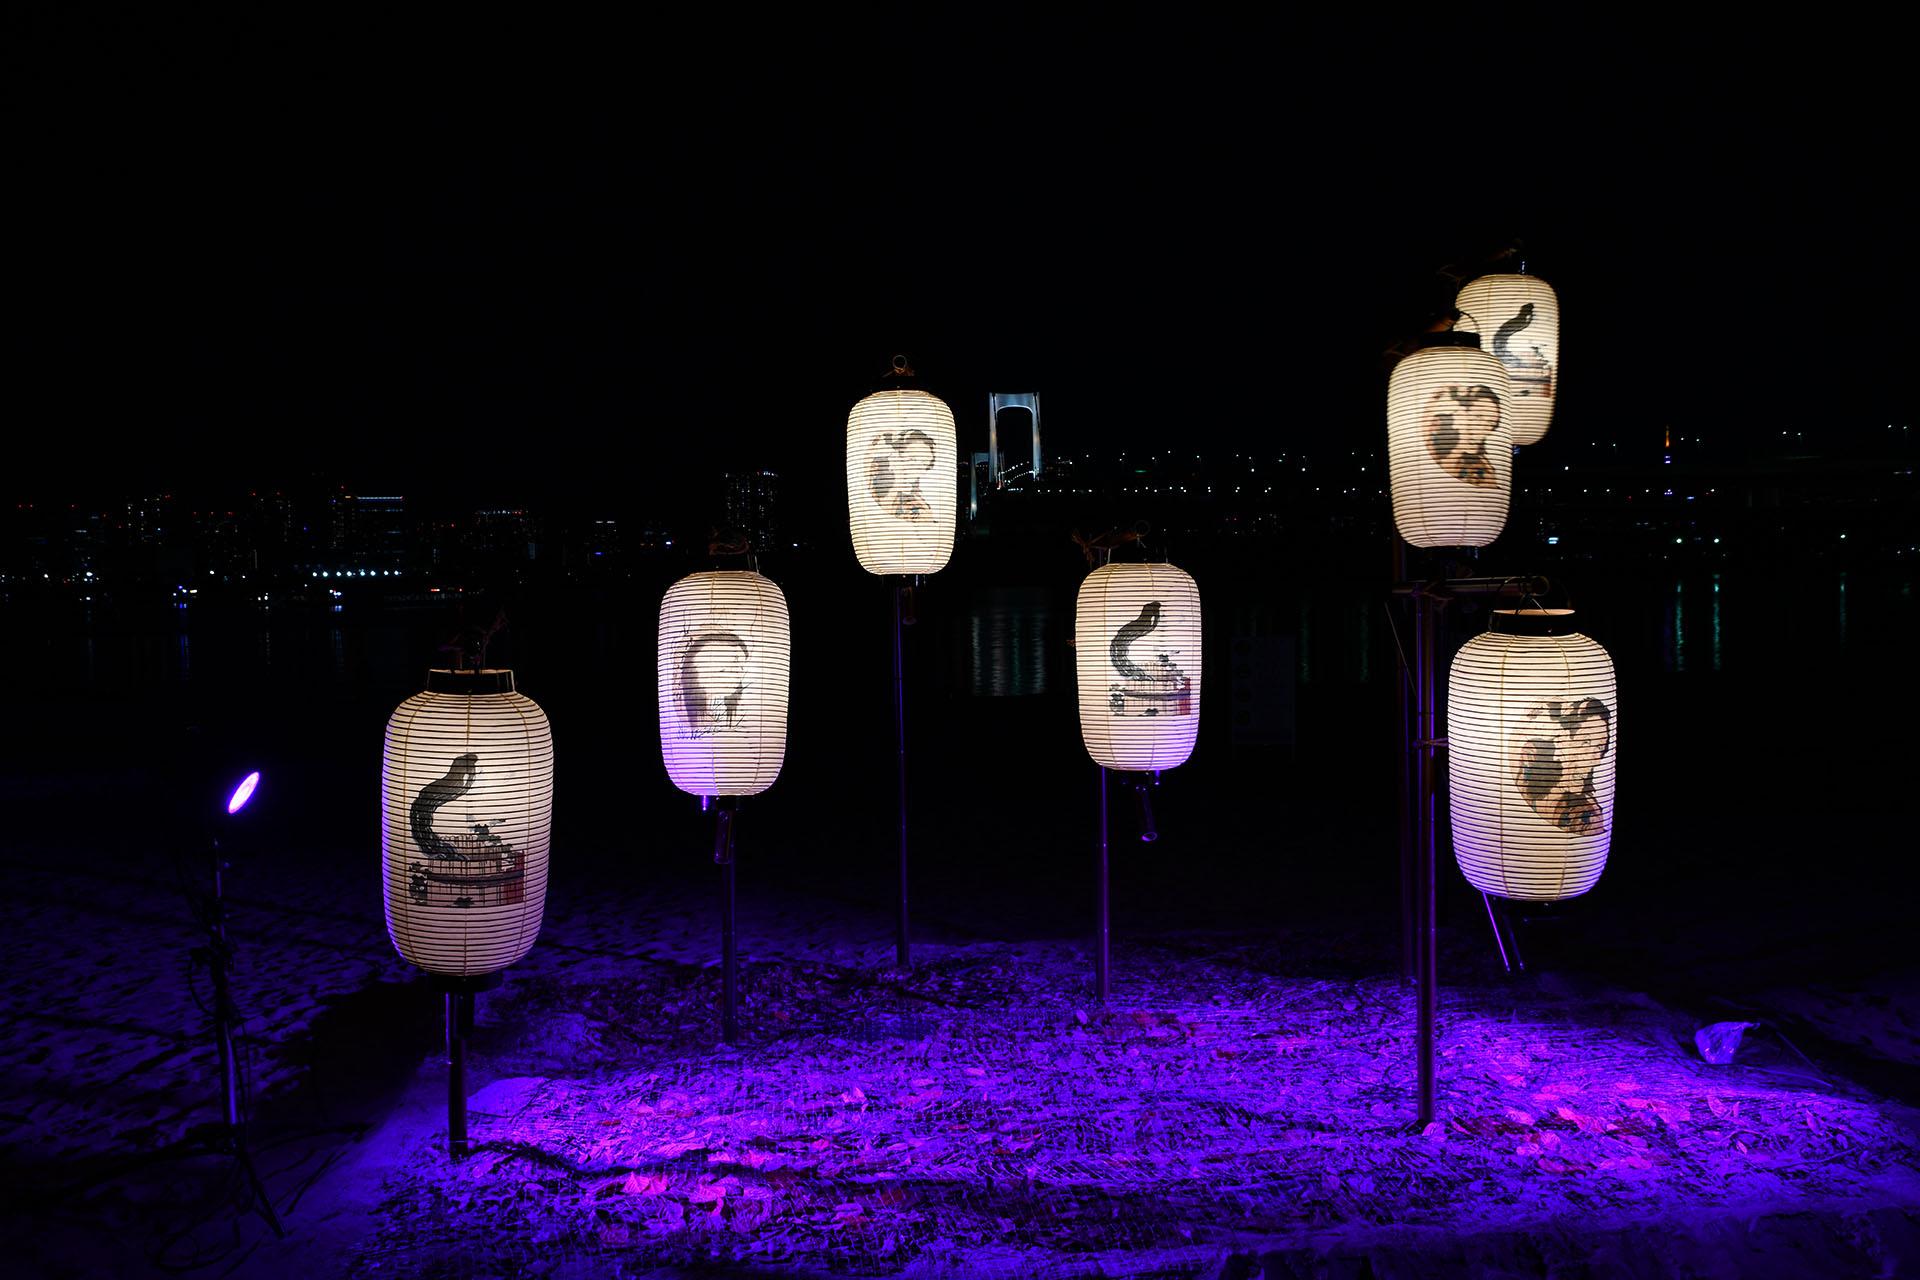 hokusai&TOKYO 水辺を彩る江戸祭 Nikon D850 タムロン 百鬼夜行街道